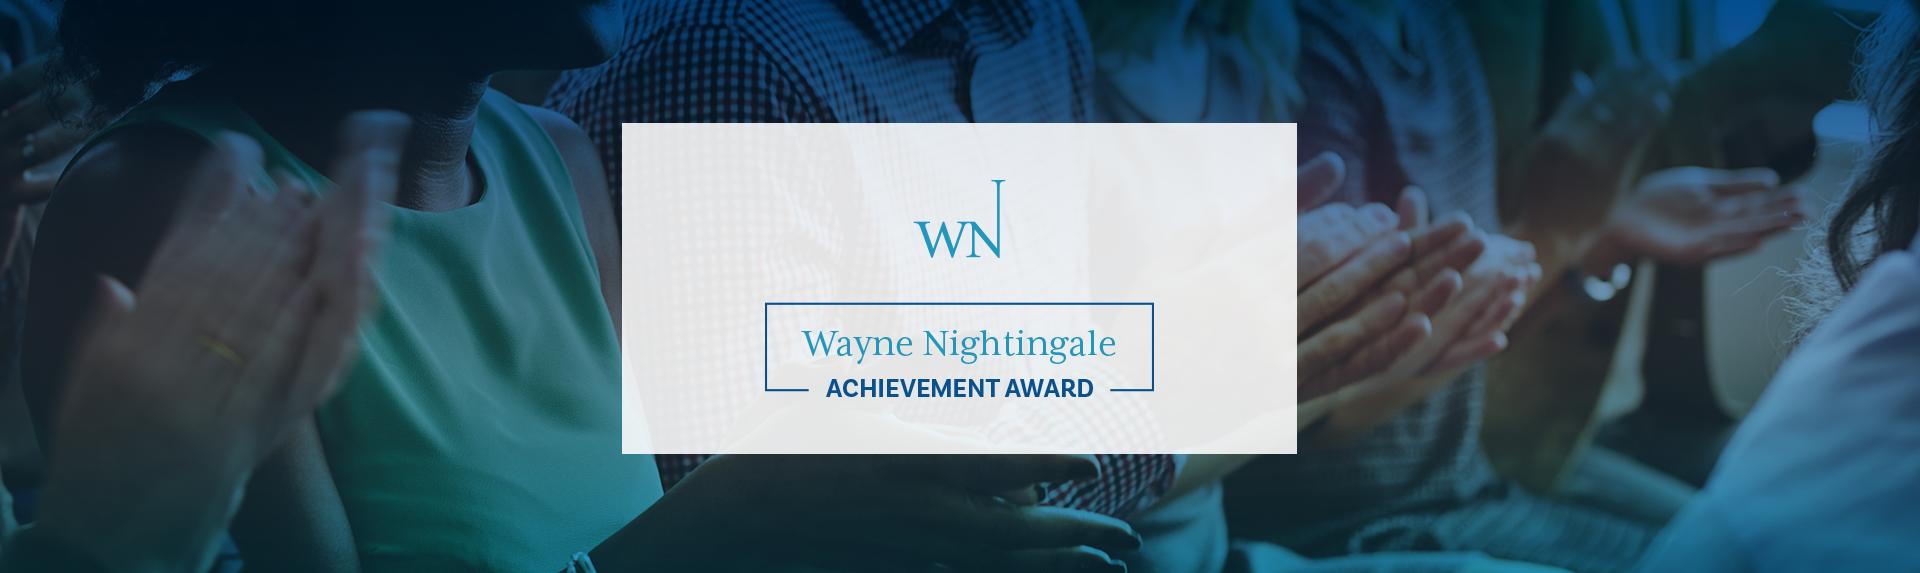 ImageUne-WayneNightingale-EN